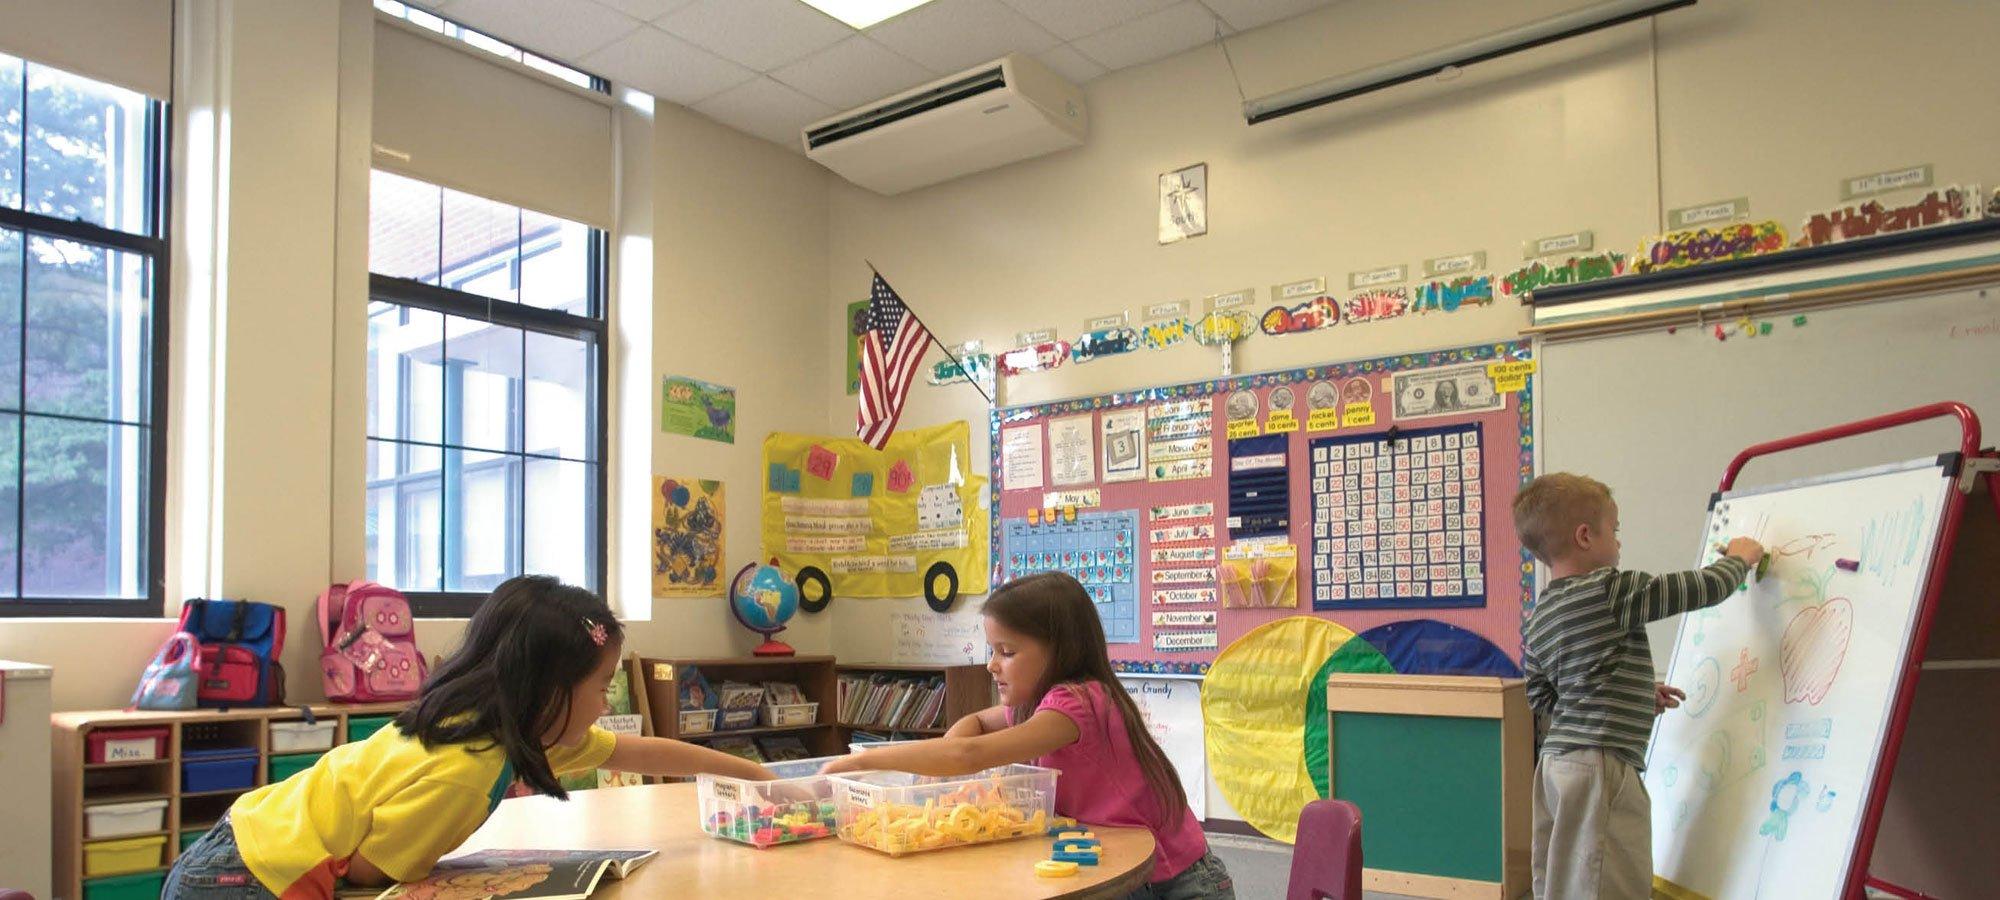 Classroom_Ductless.jpg